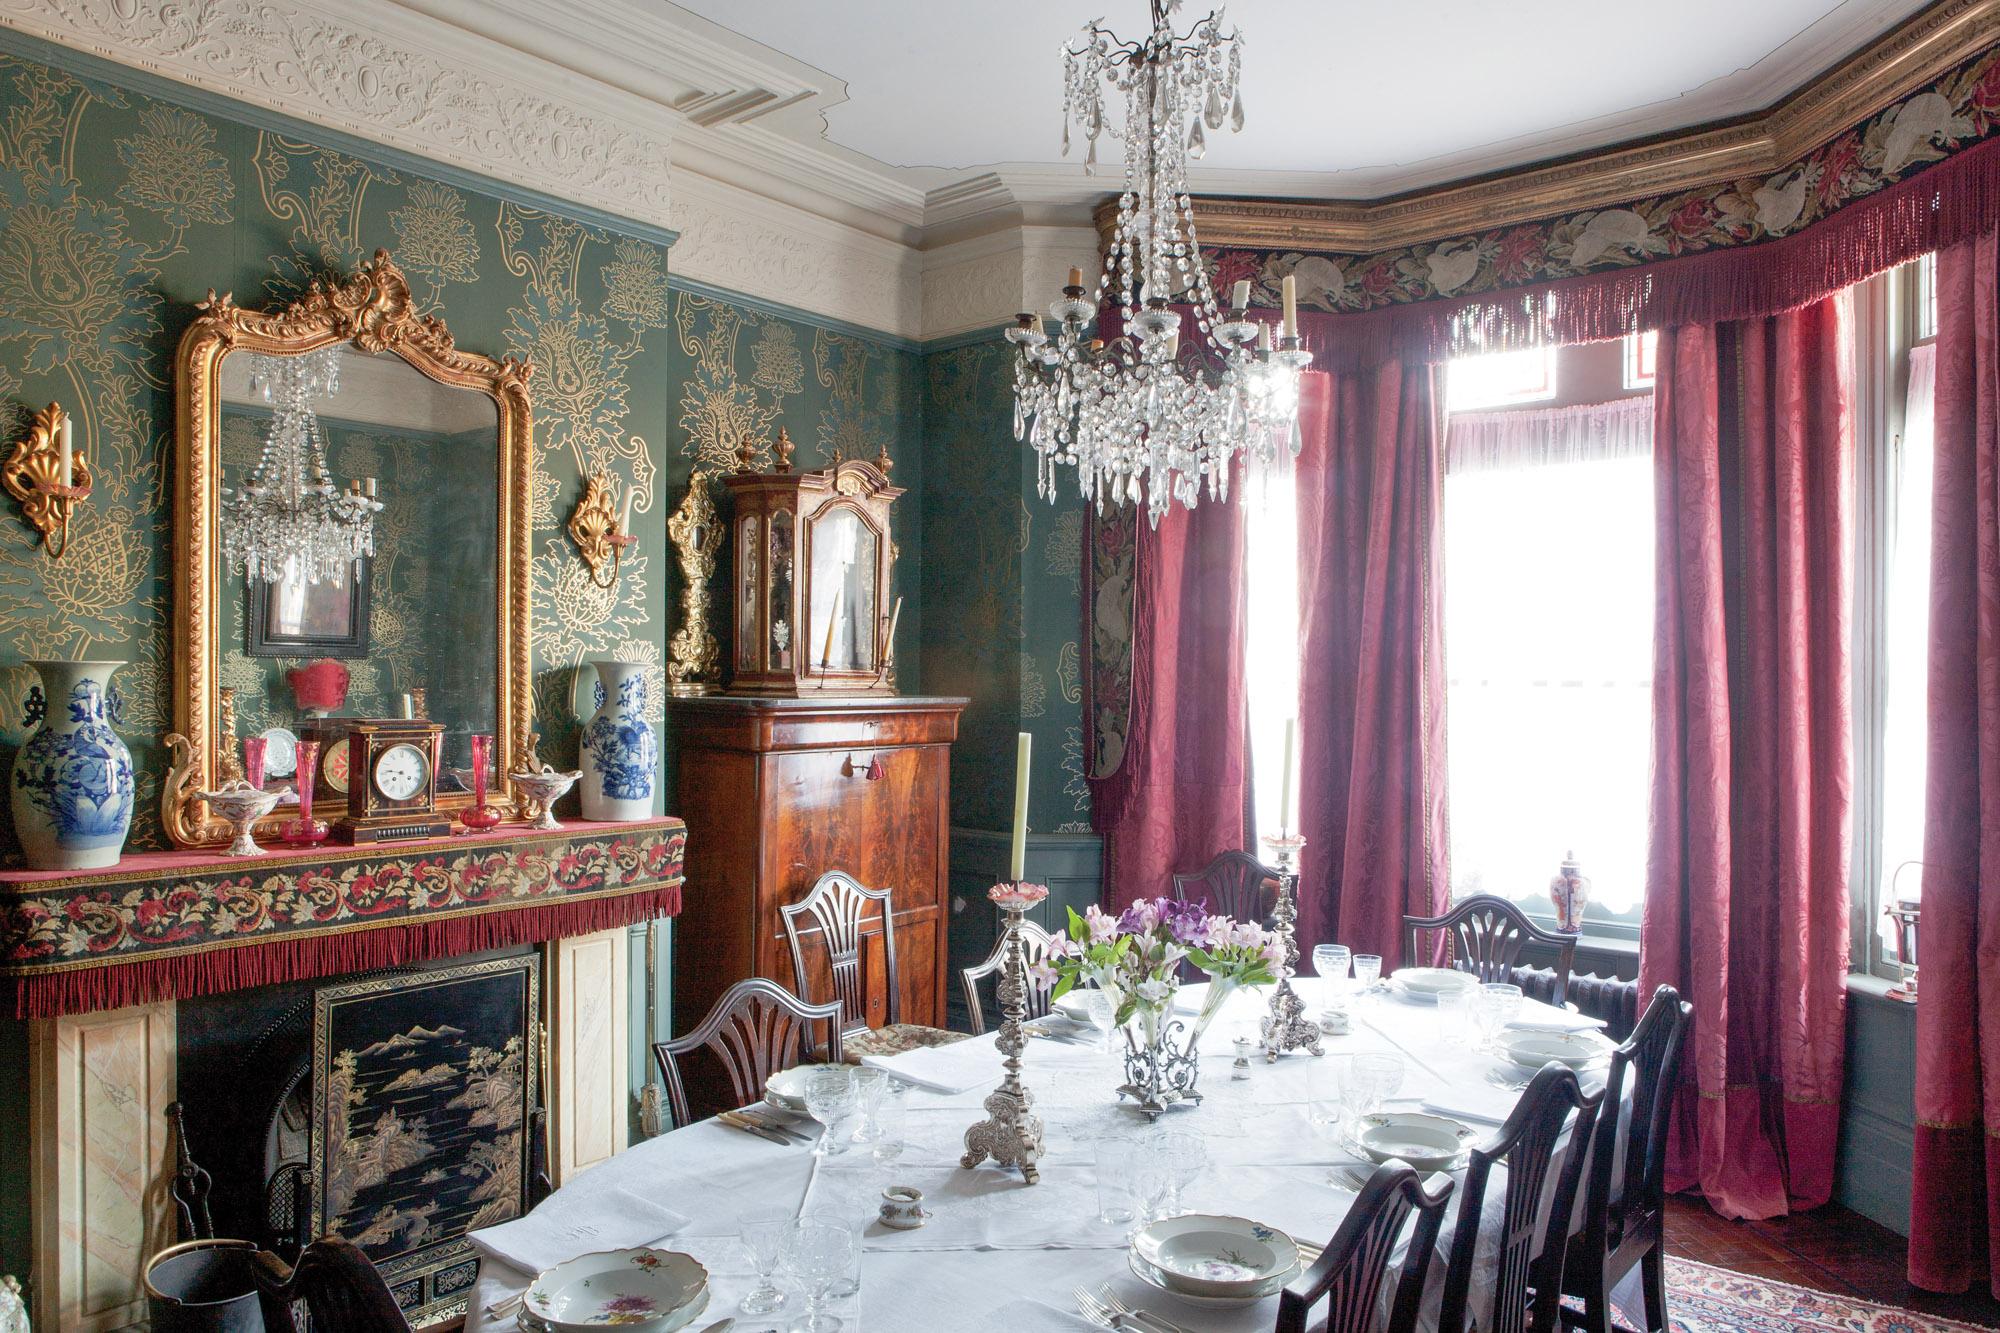 St. Benedict dining room